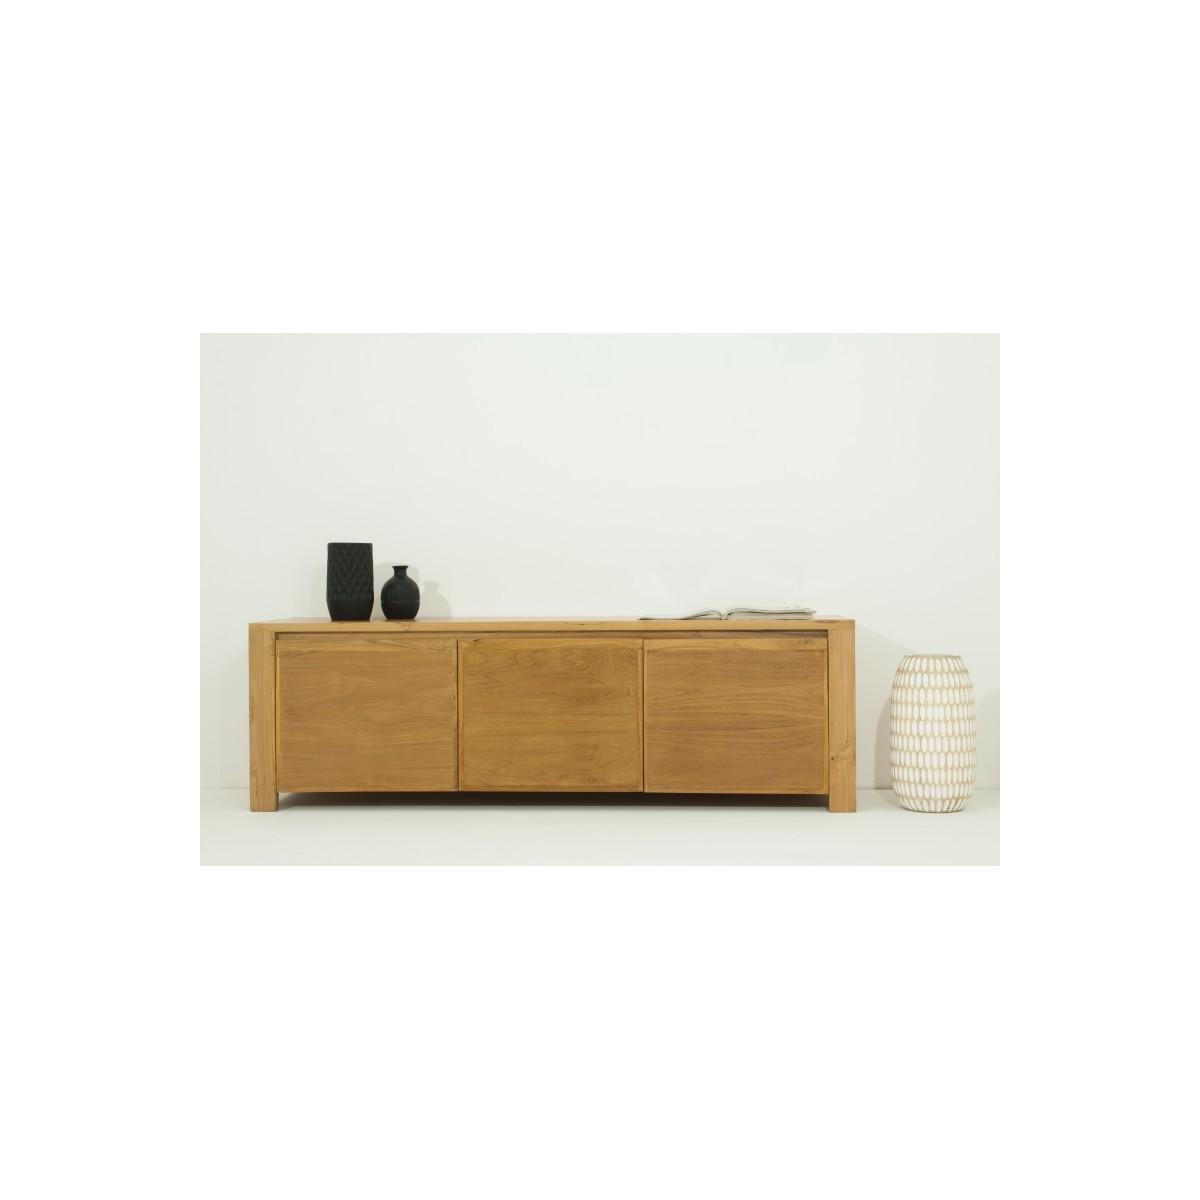 meuble tv bas contemporain 3 portes anatoly en teck massif naturel amp story 5393